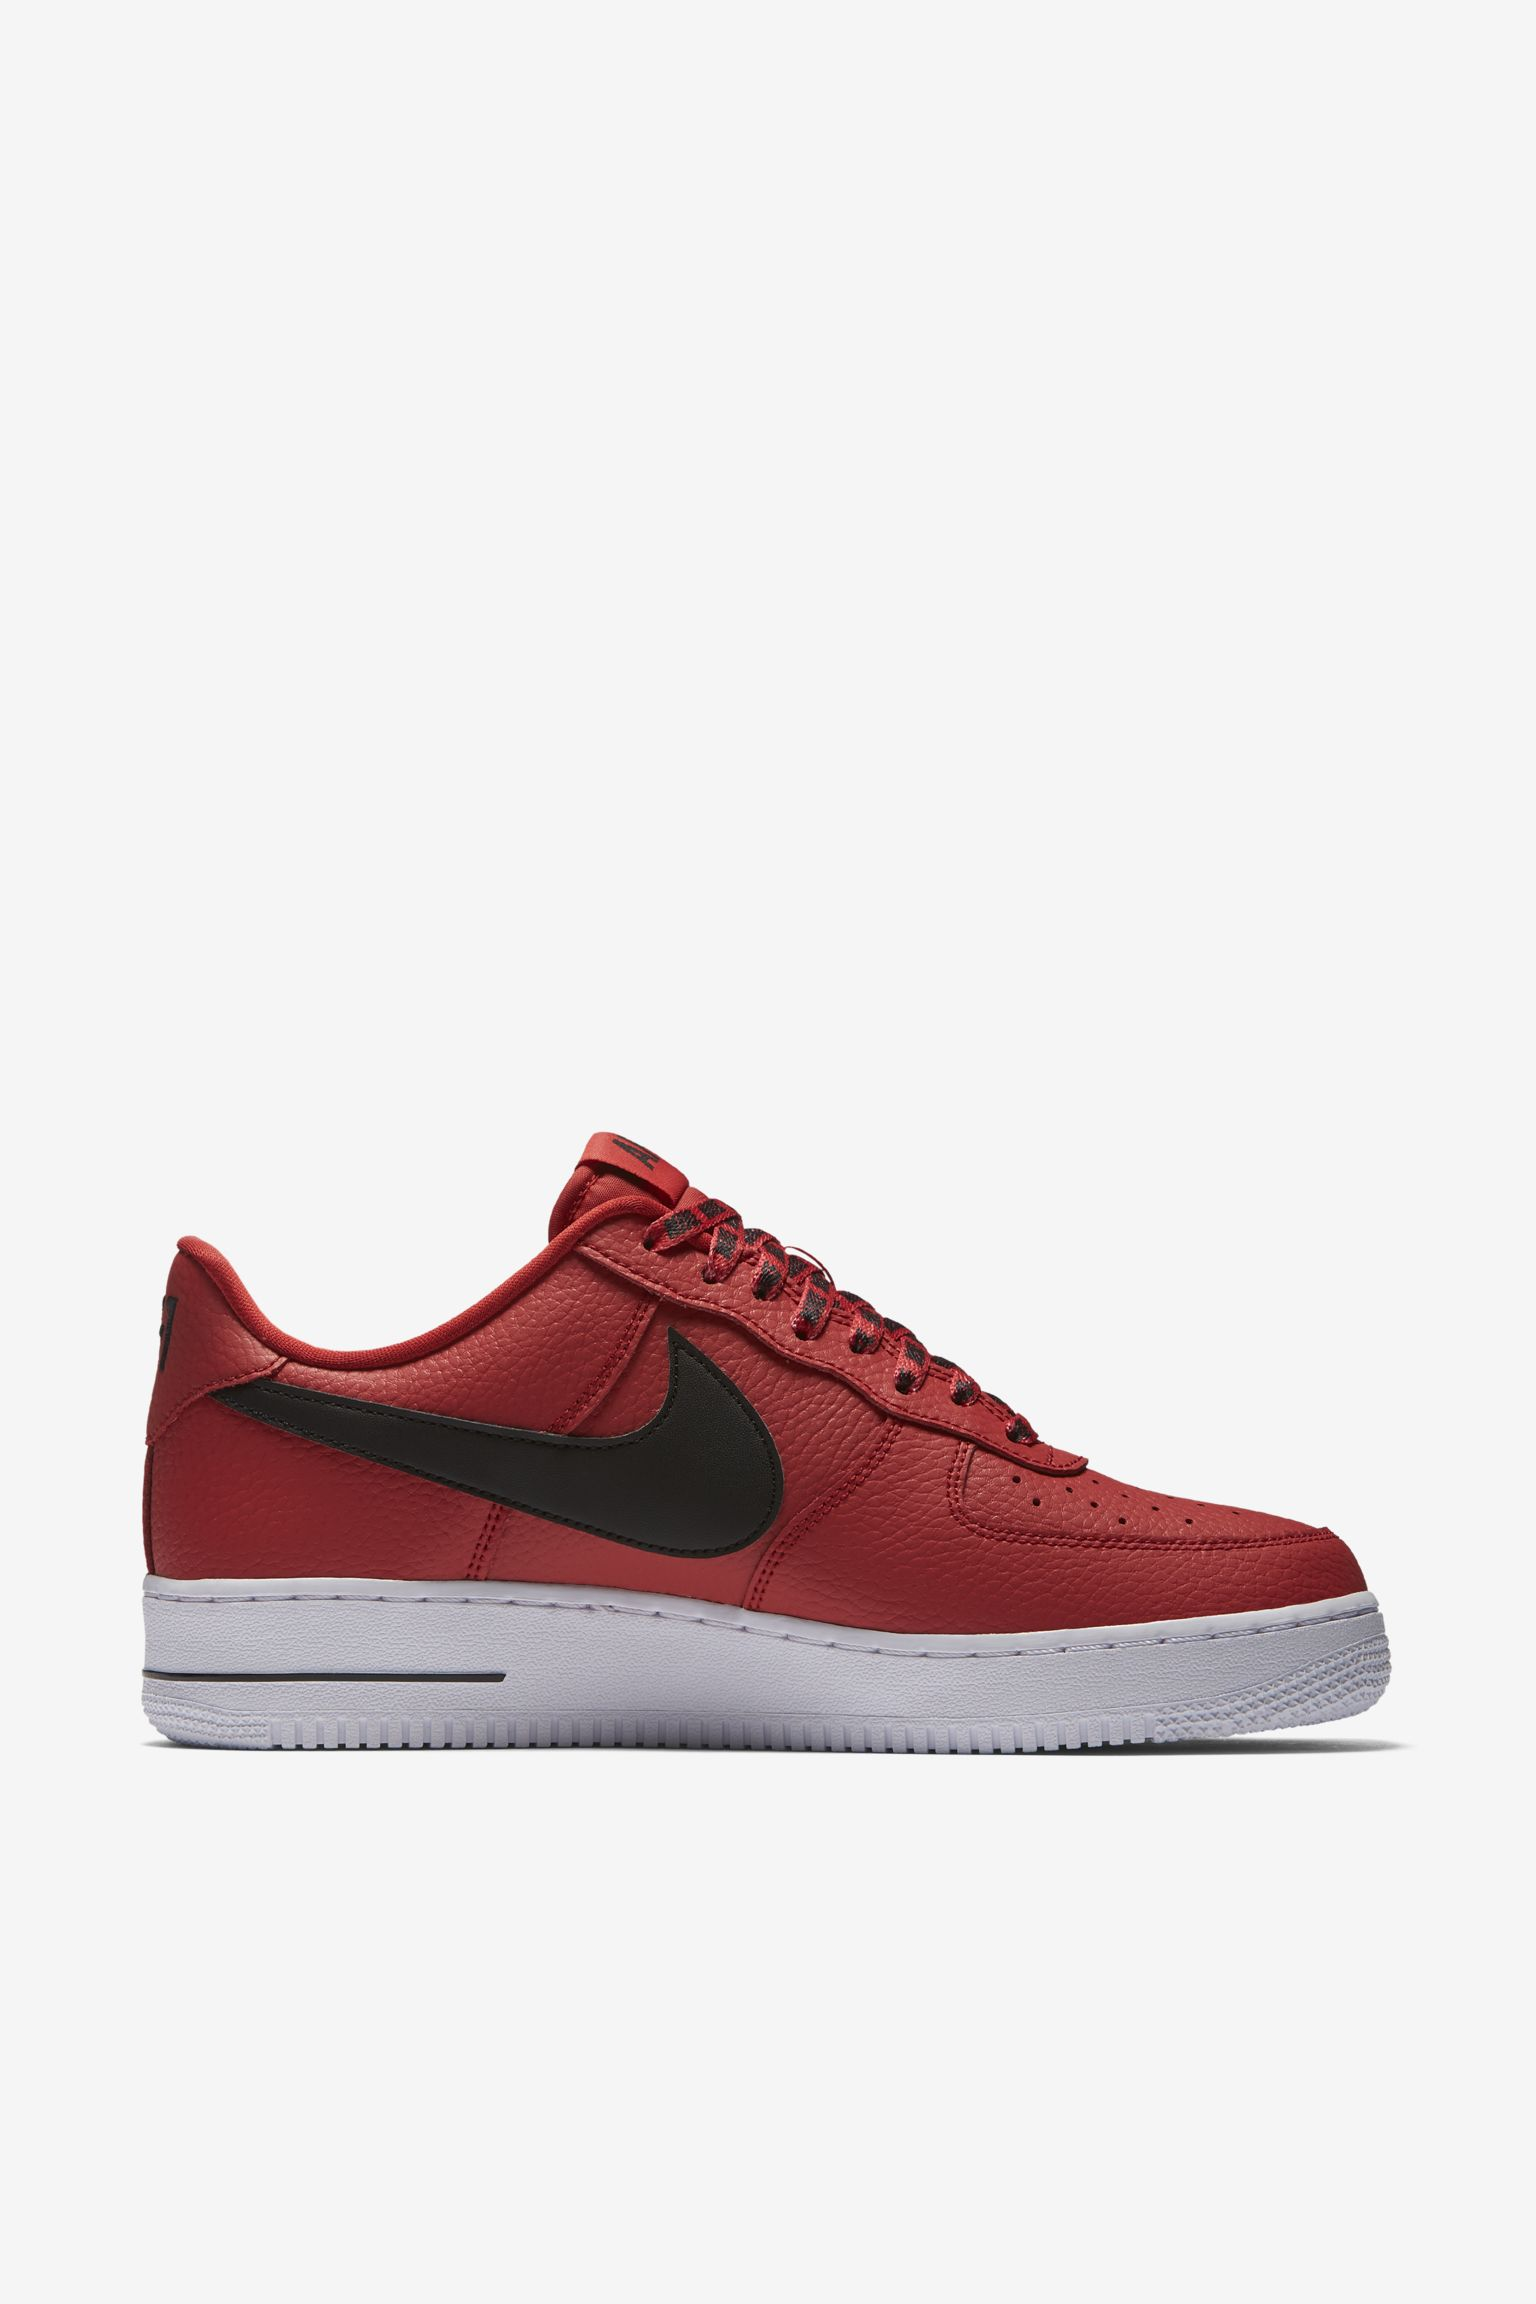 Nike Af 1 Low Nba University Red & Black & White